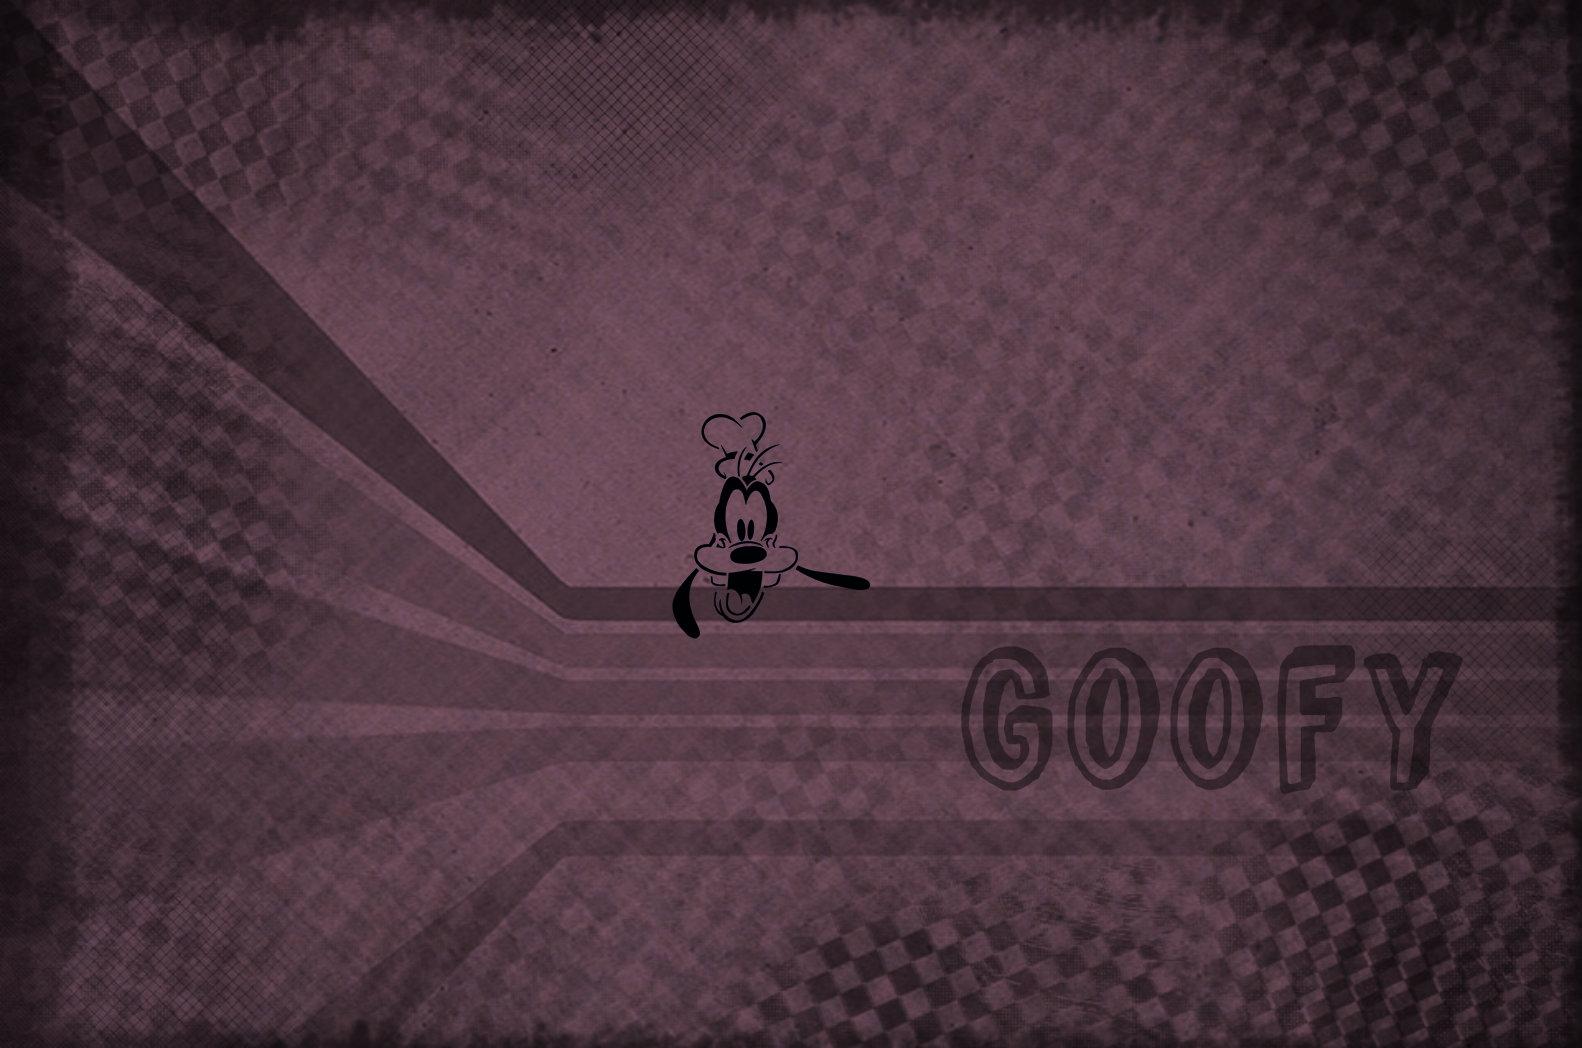 http://1.bp.blogspot.com/-KhYHqPUDXqU/UHrYgRfzdDI/AAAAAAAAAl4/e26TvGdRIOE/s1600/goofy-stencil-240x240.jpg